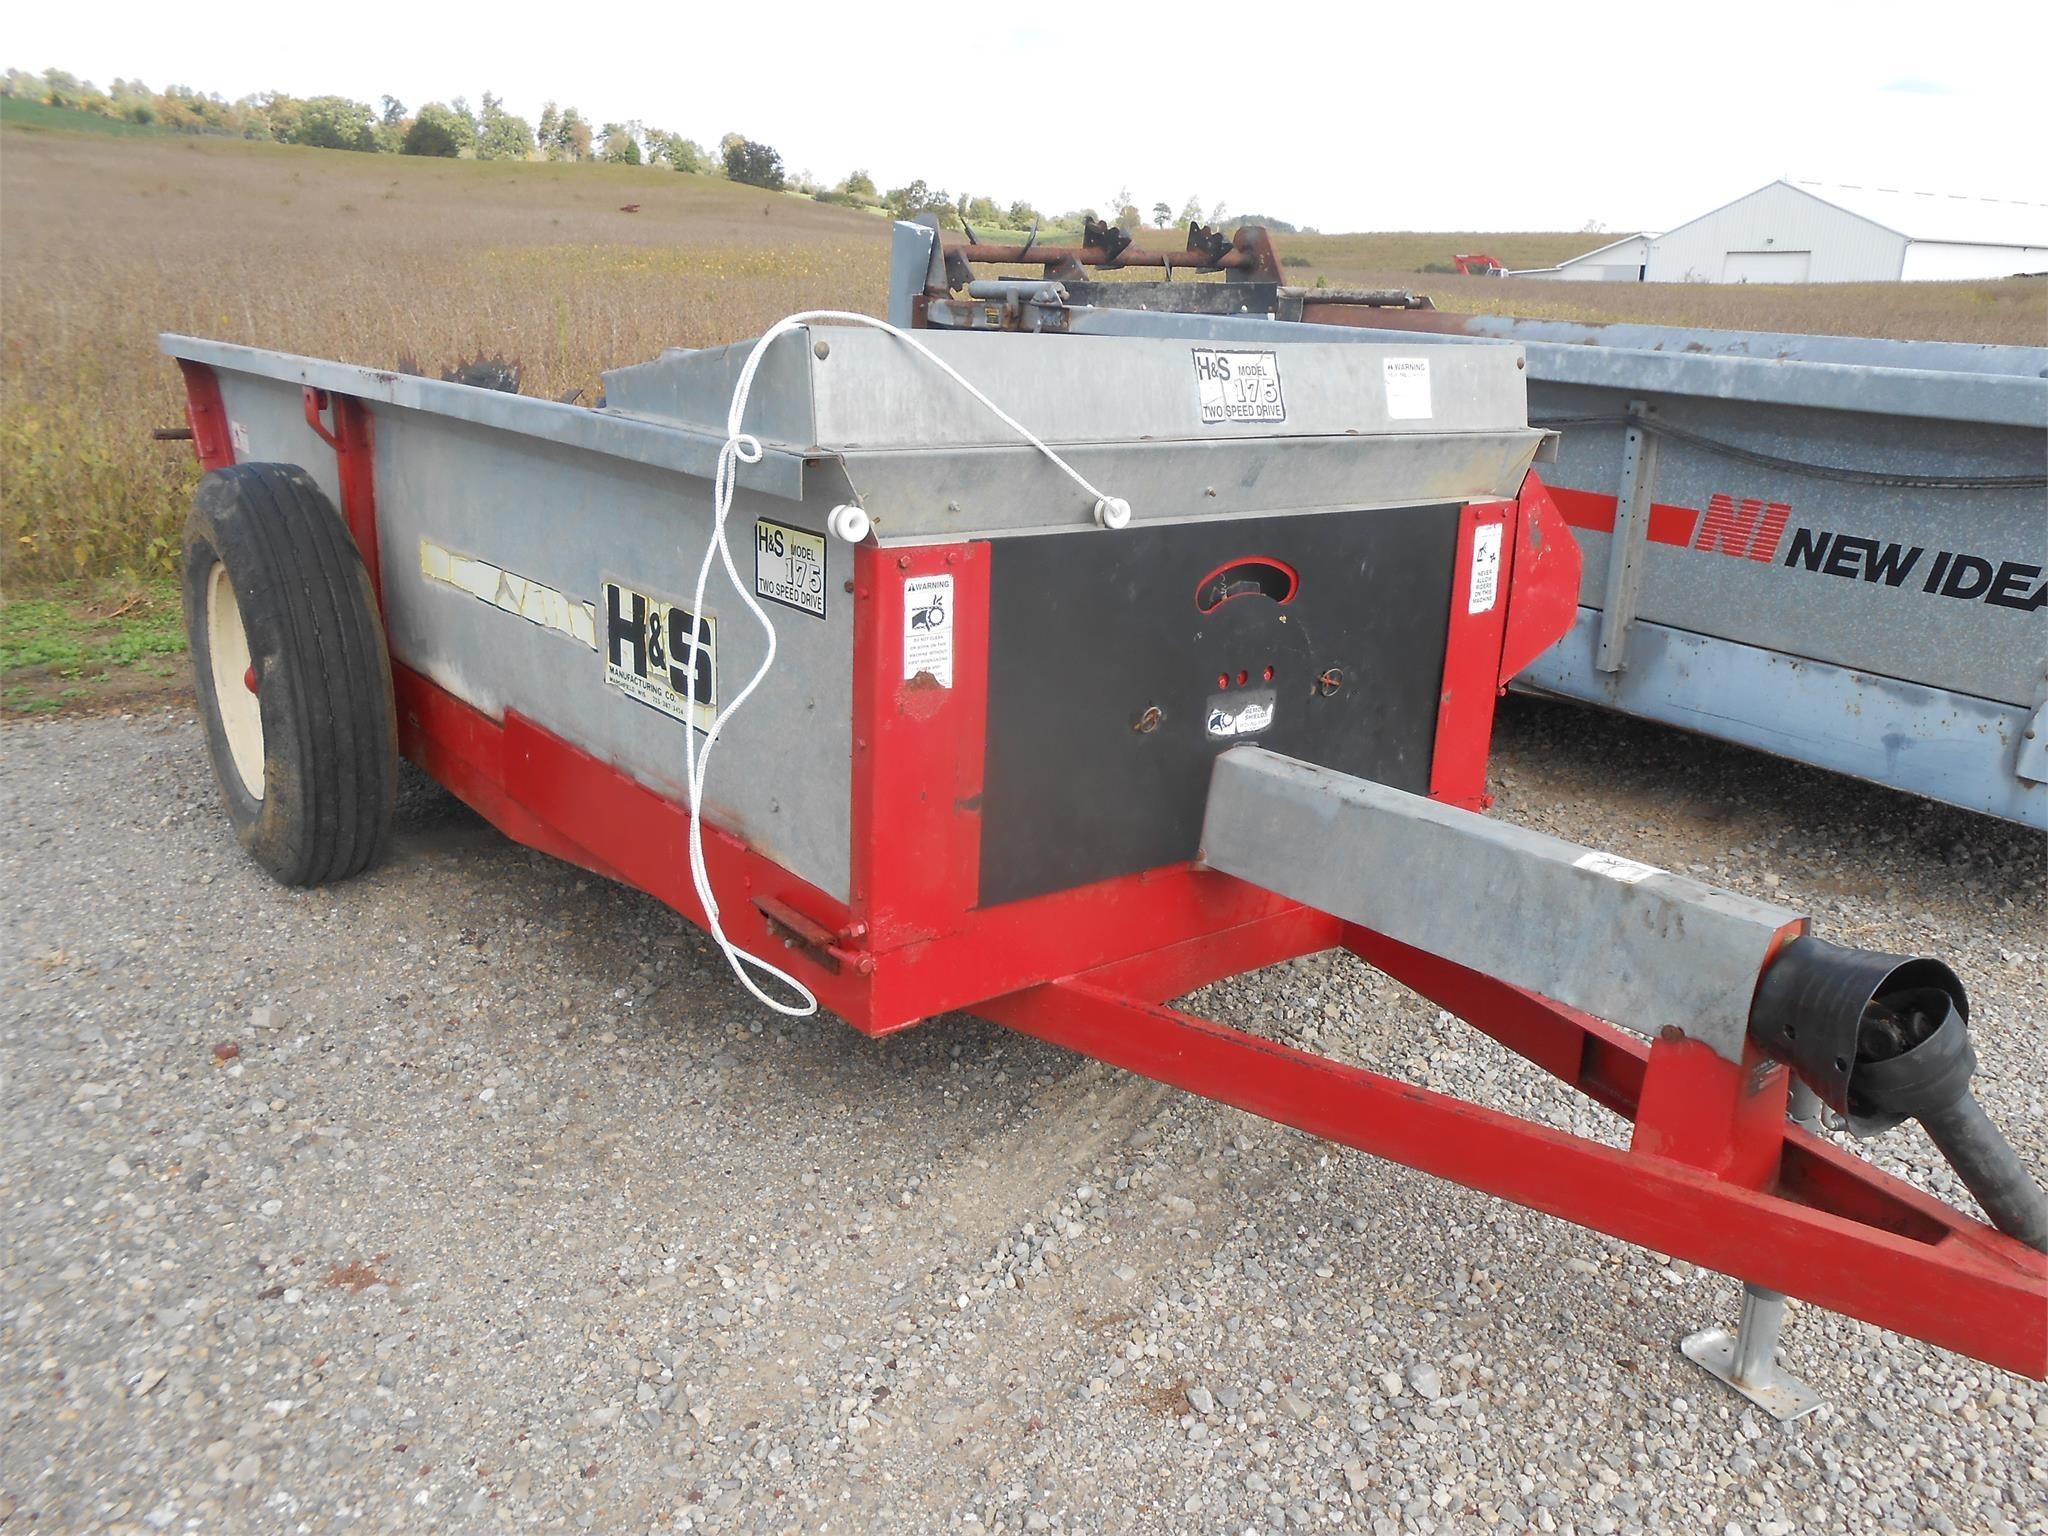 H & S 175 Manure Spreader